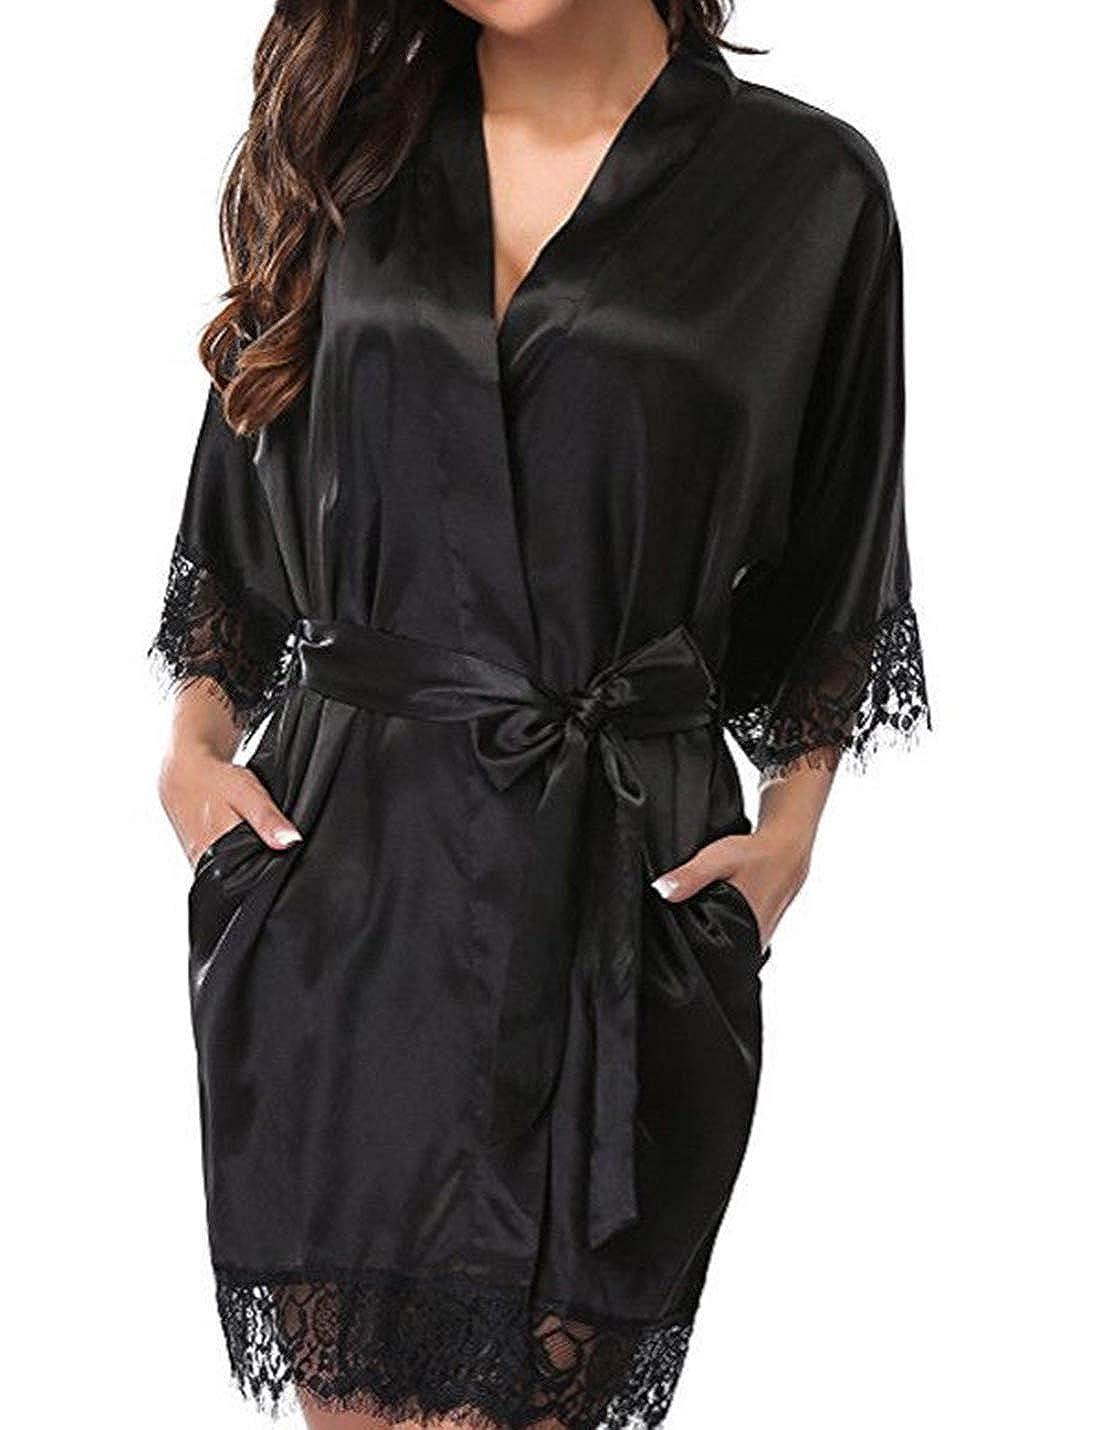 Naliha Las Mujeres Vestido Kimono Albornoz Lace Stich Wrap ...